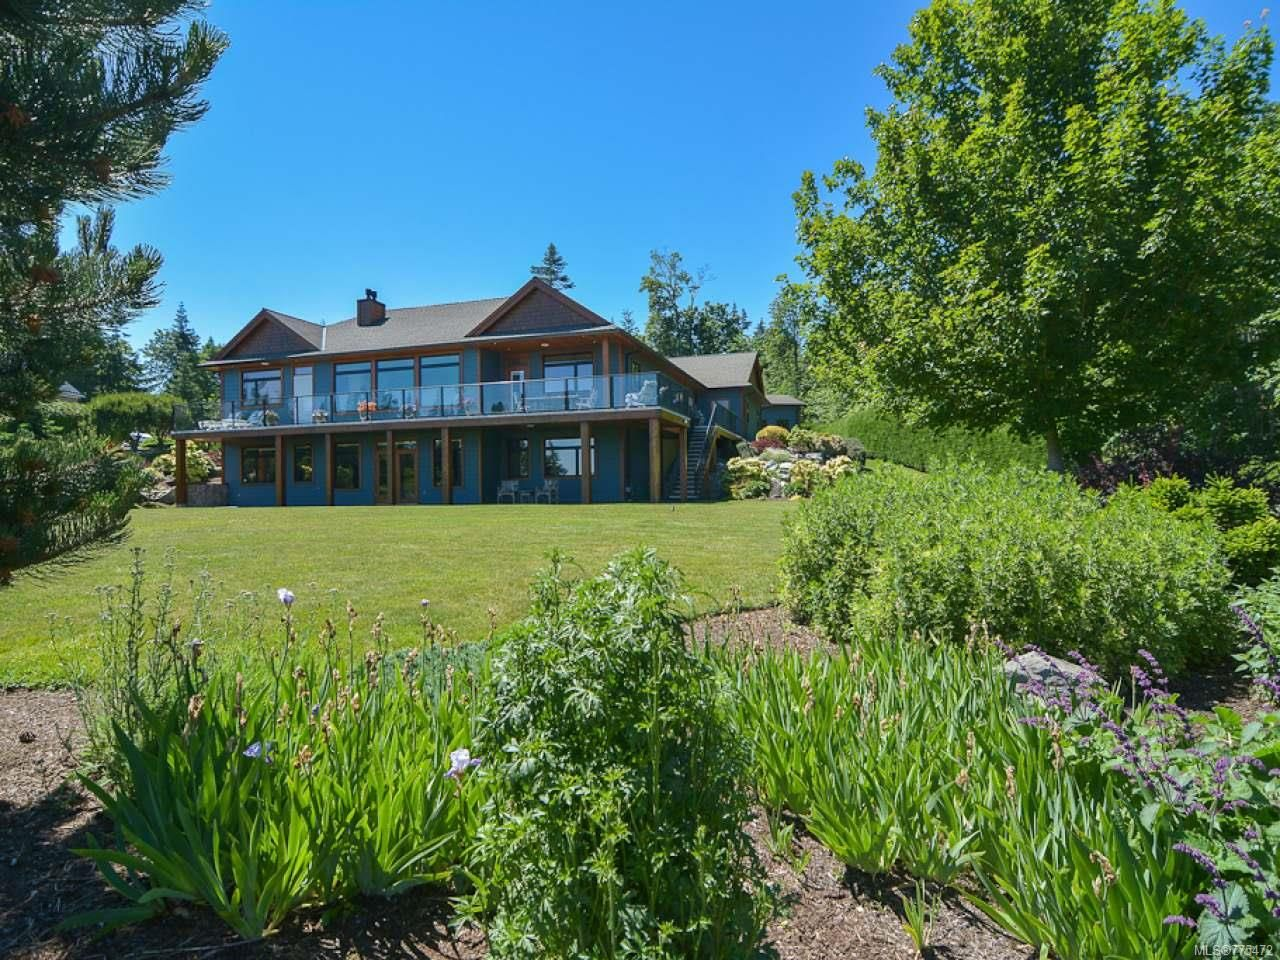 Main Photo: 6472 BISHOP ROAD in COURTENAY: CV Courtenay North House for sale (Comox Valley)  : MLS®# 775472